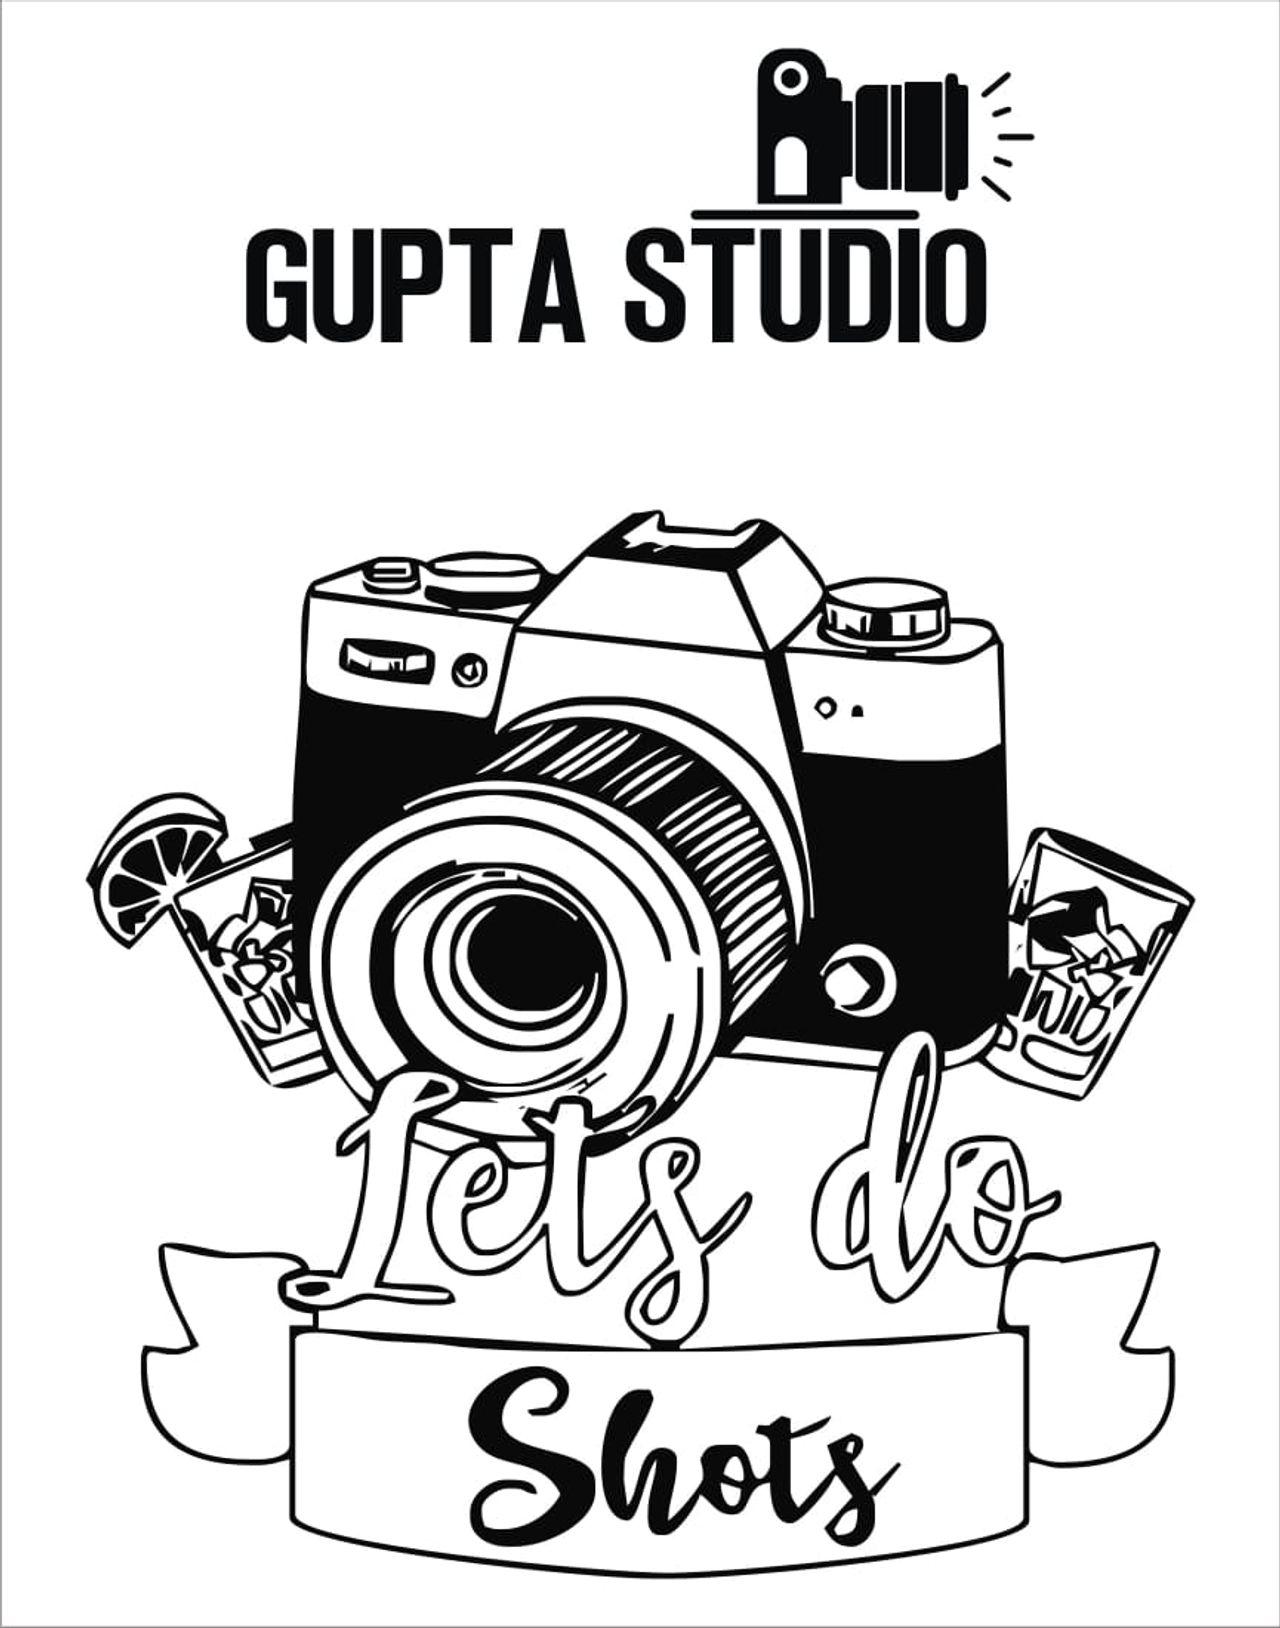 Gupta Studio | Phtostudio Cover Image